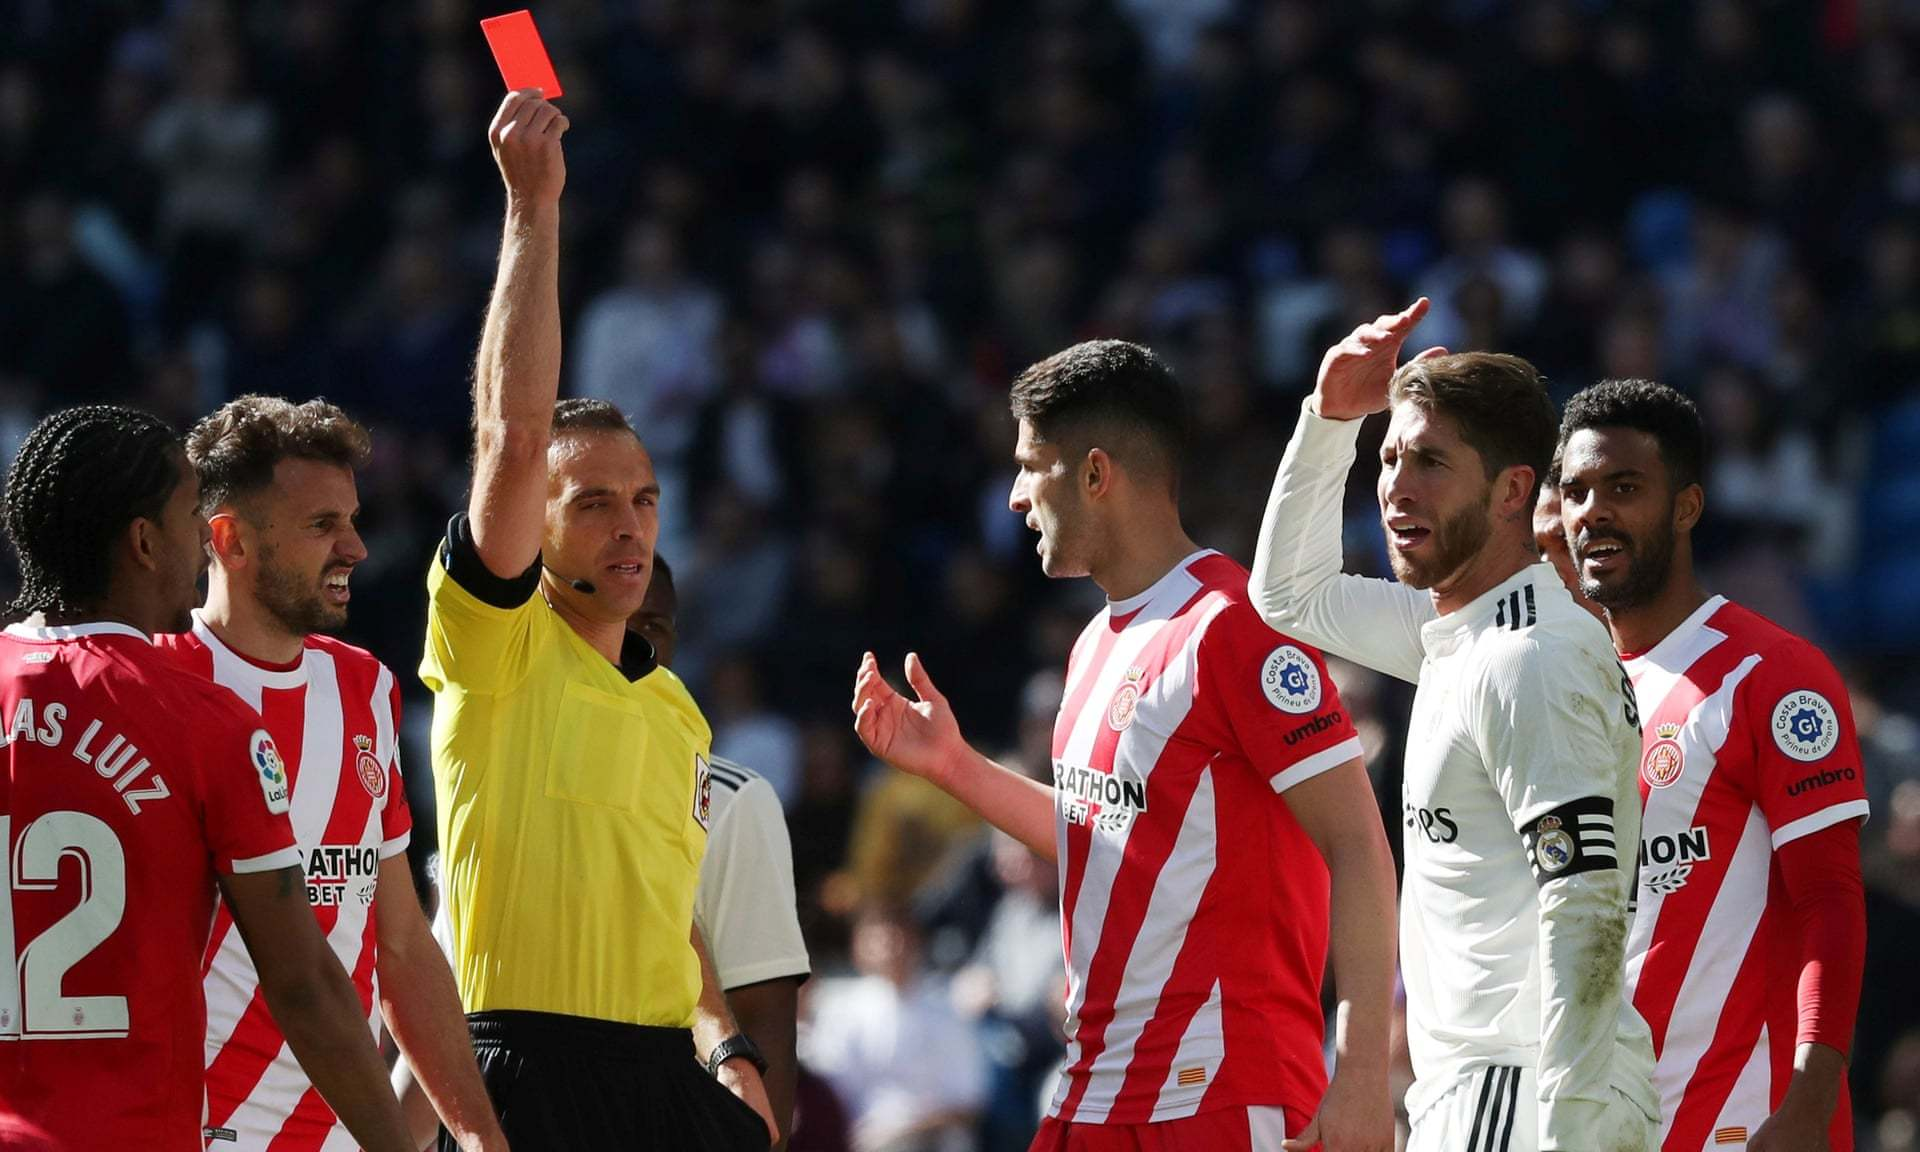 Real Madrid 1-2 Girona: Real thất bại trong ngày Ramos lập kỷ lục buồn